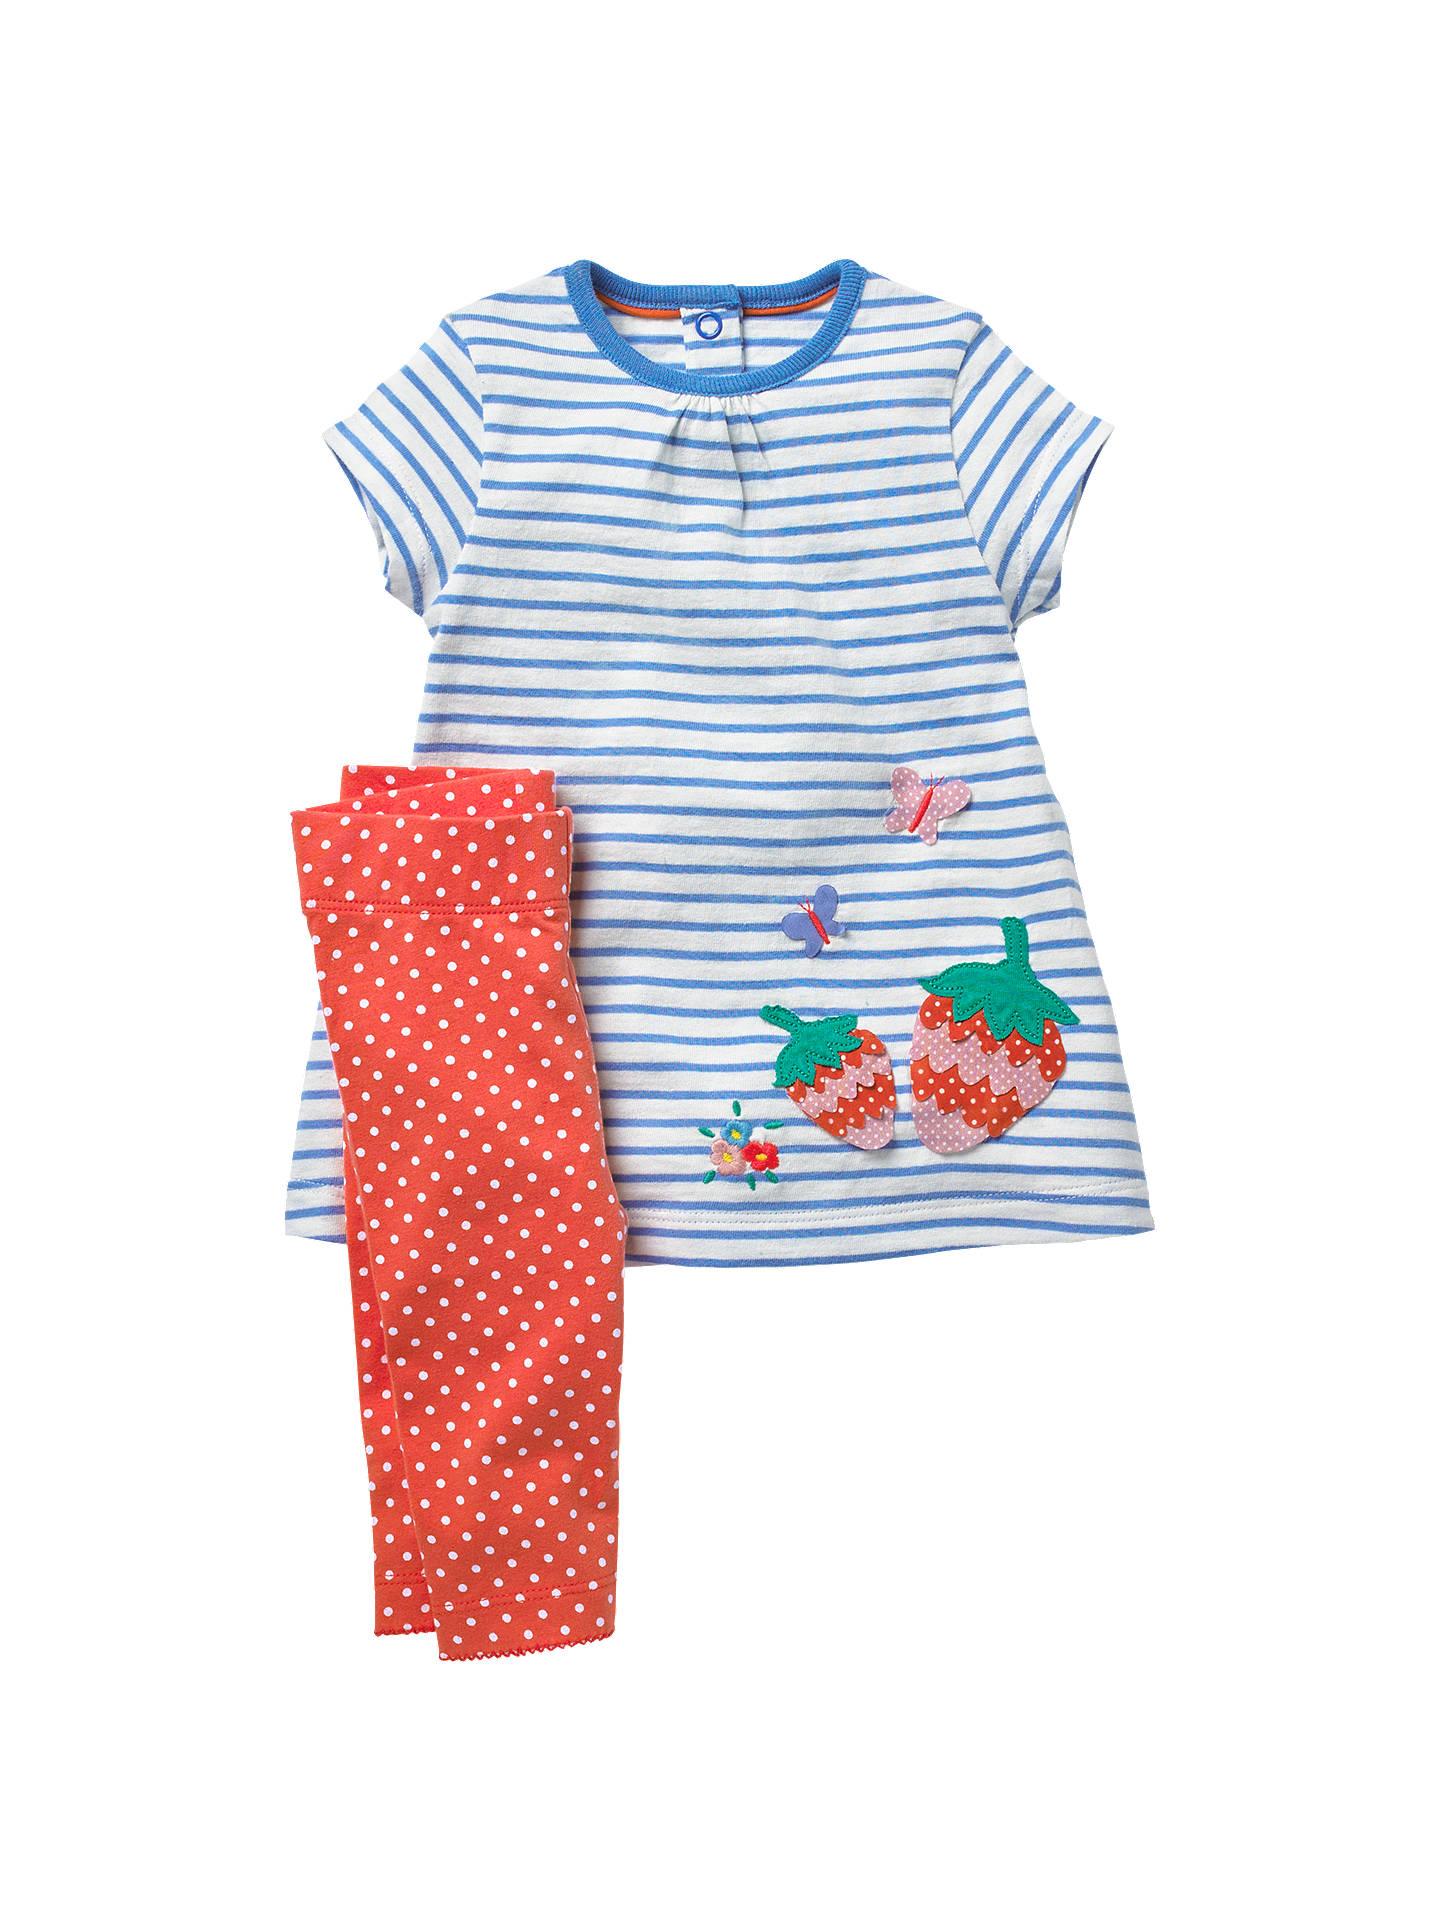 6d68fccd4ec5 Buy Mini Boden Baby Strawberry Jersey Dress and Leggings Set, Blue, 0-3 ...